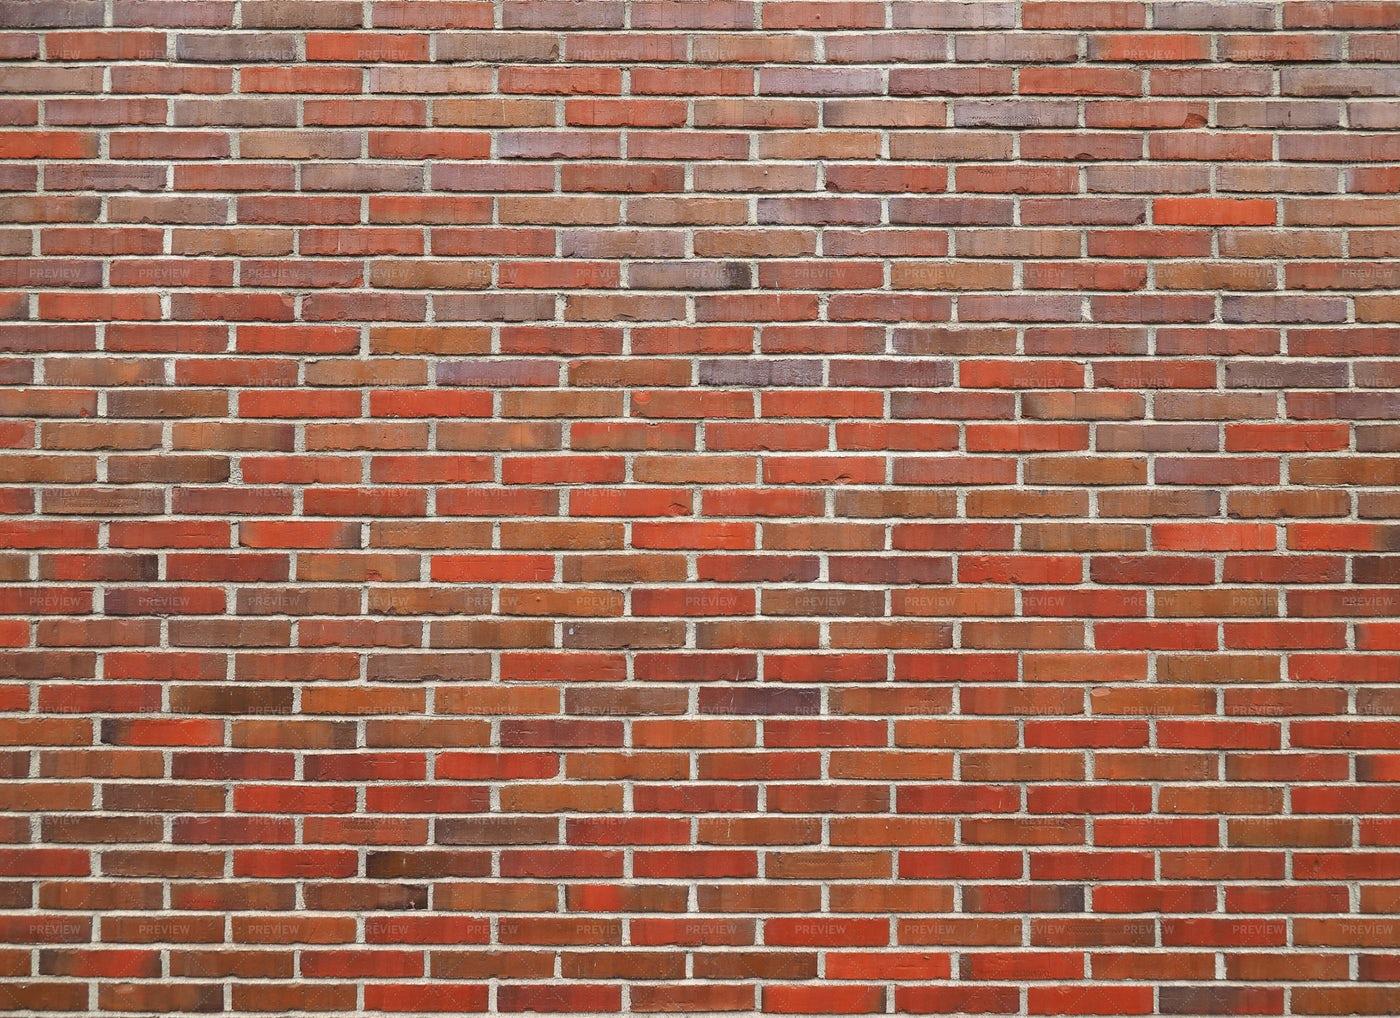 Large Red Bricks Wall: Stock Photos